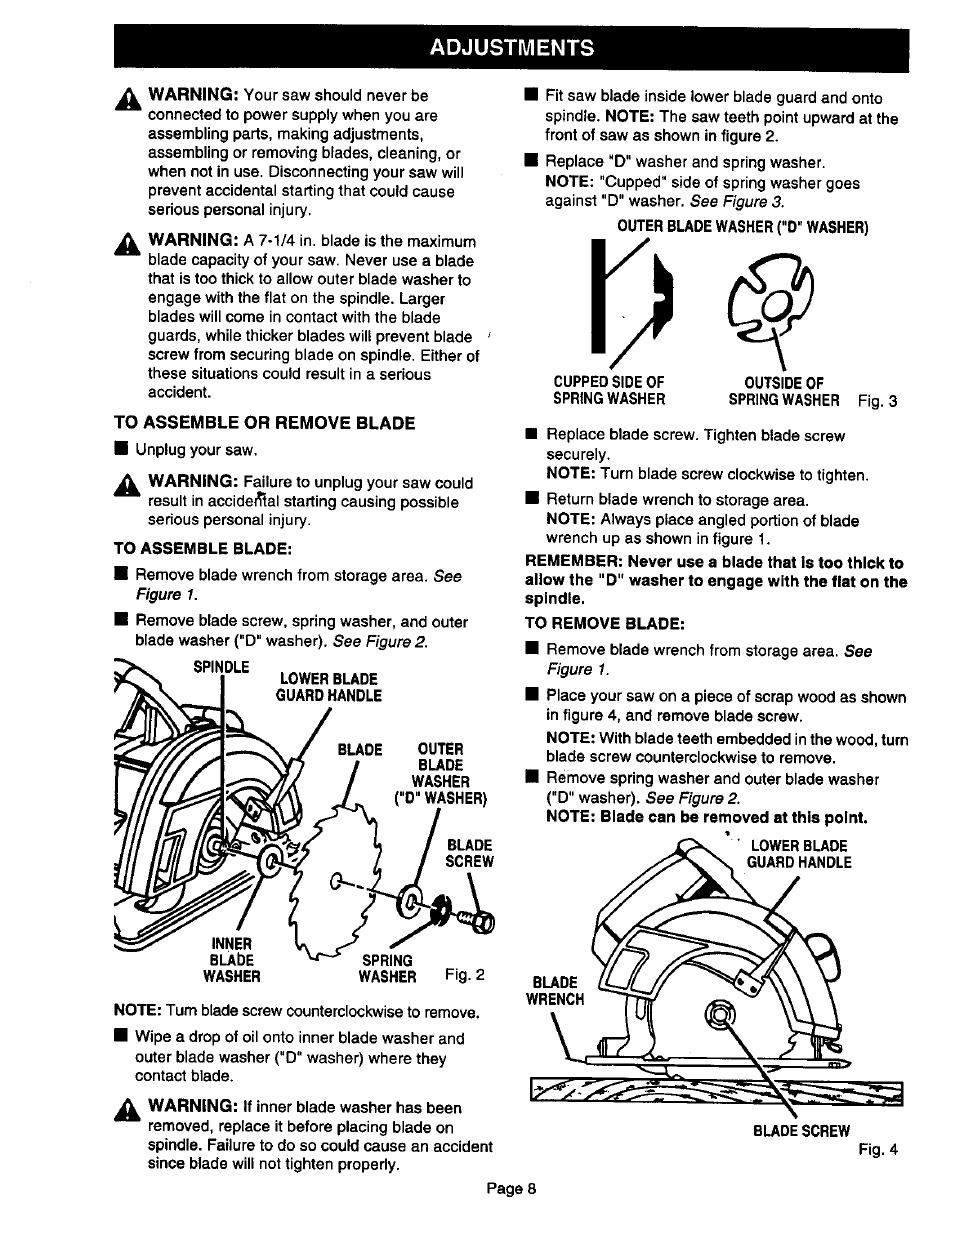 to assemble or remove blade adjustments craftsman 315 108340 user rh manualsdir com Craftsman Snow Blower Manuals 24788190 0 Craftsman Instruction Manual